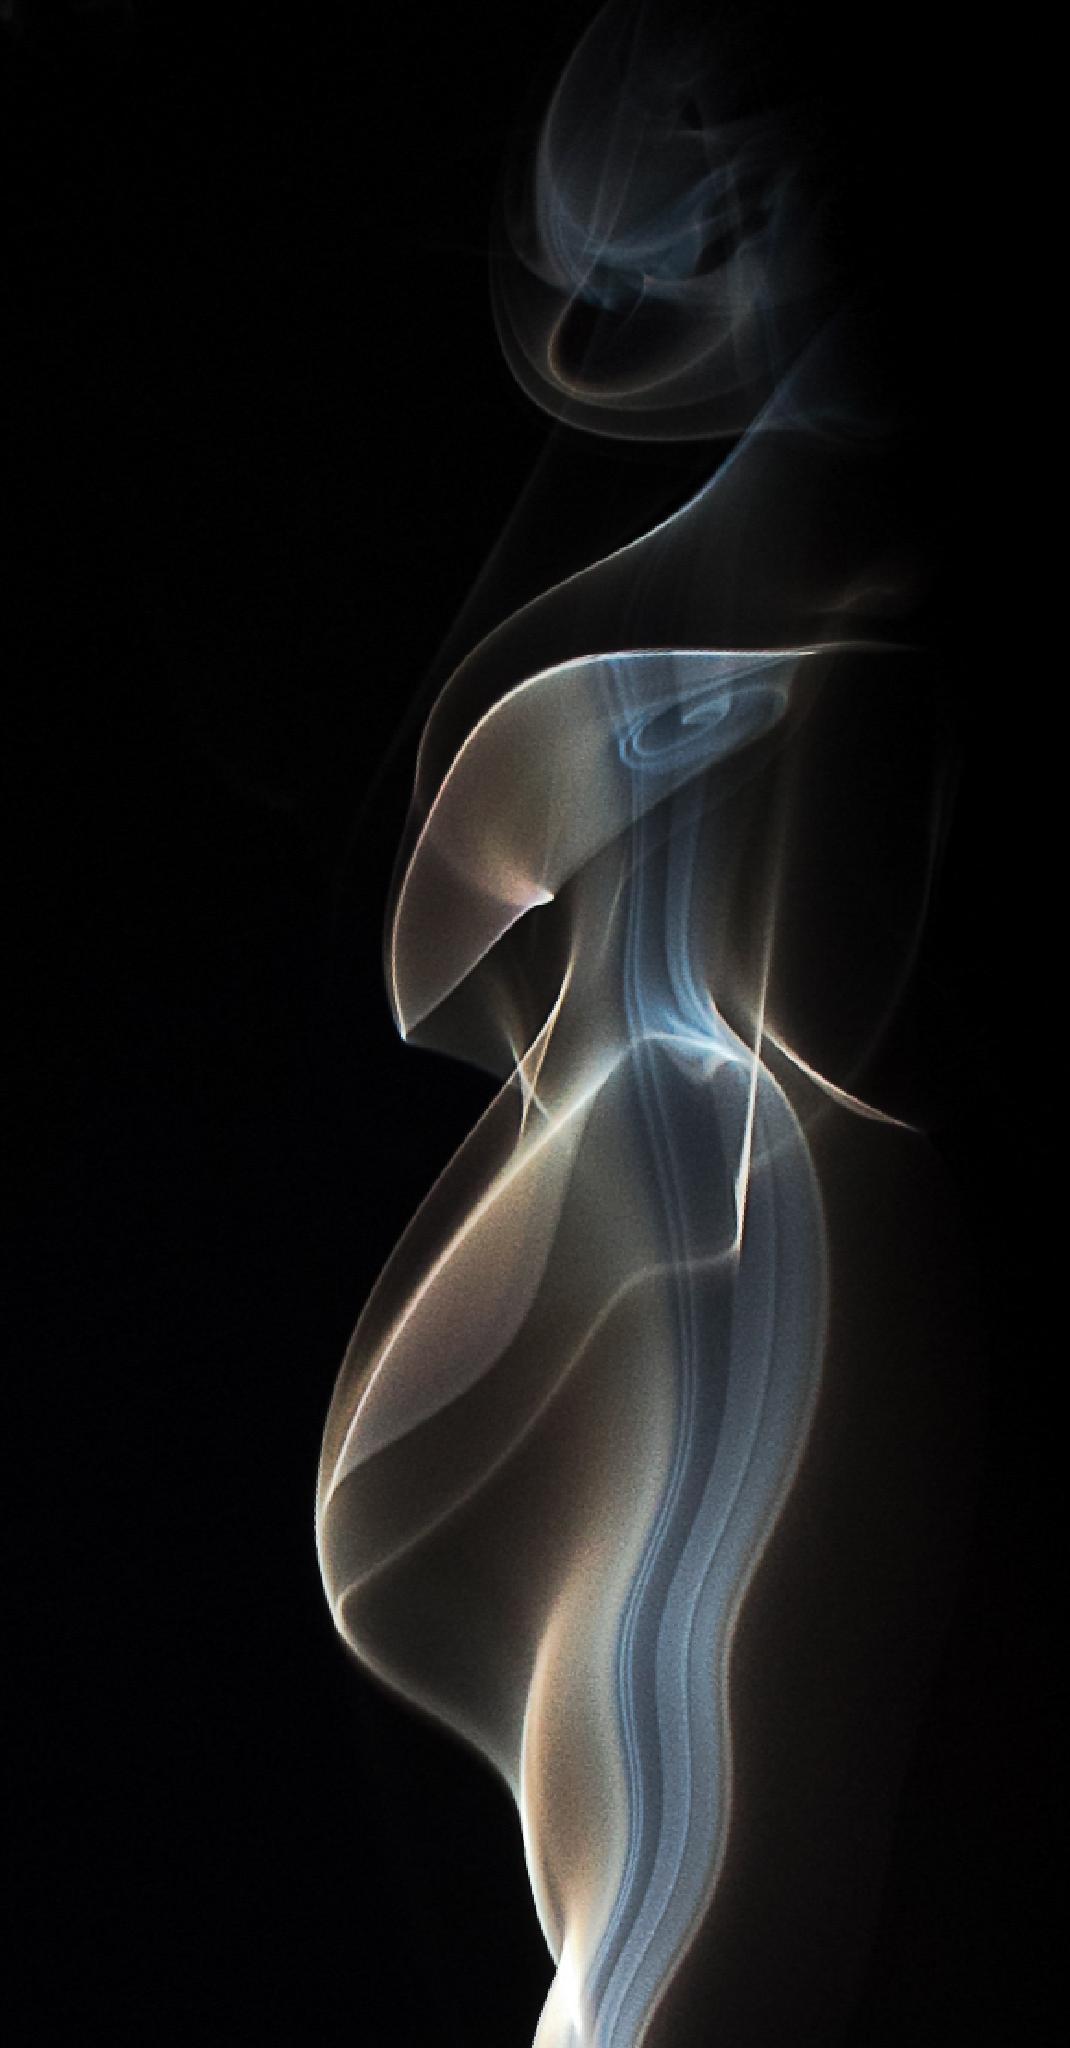 smoke 2 by jimsharpness